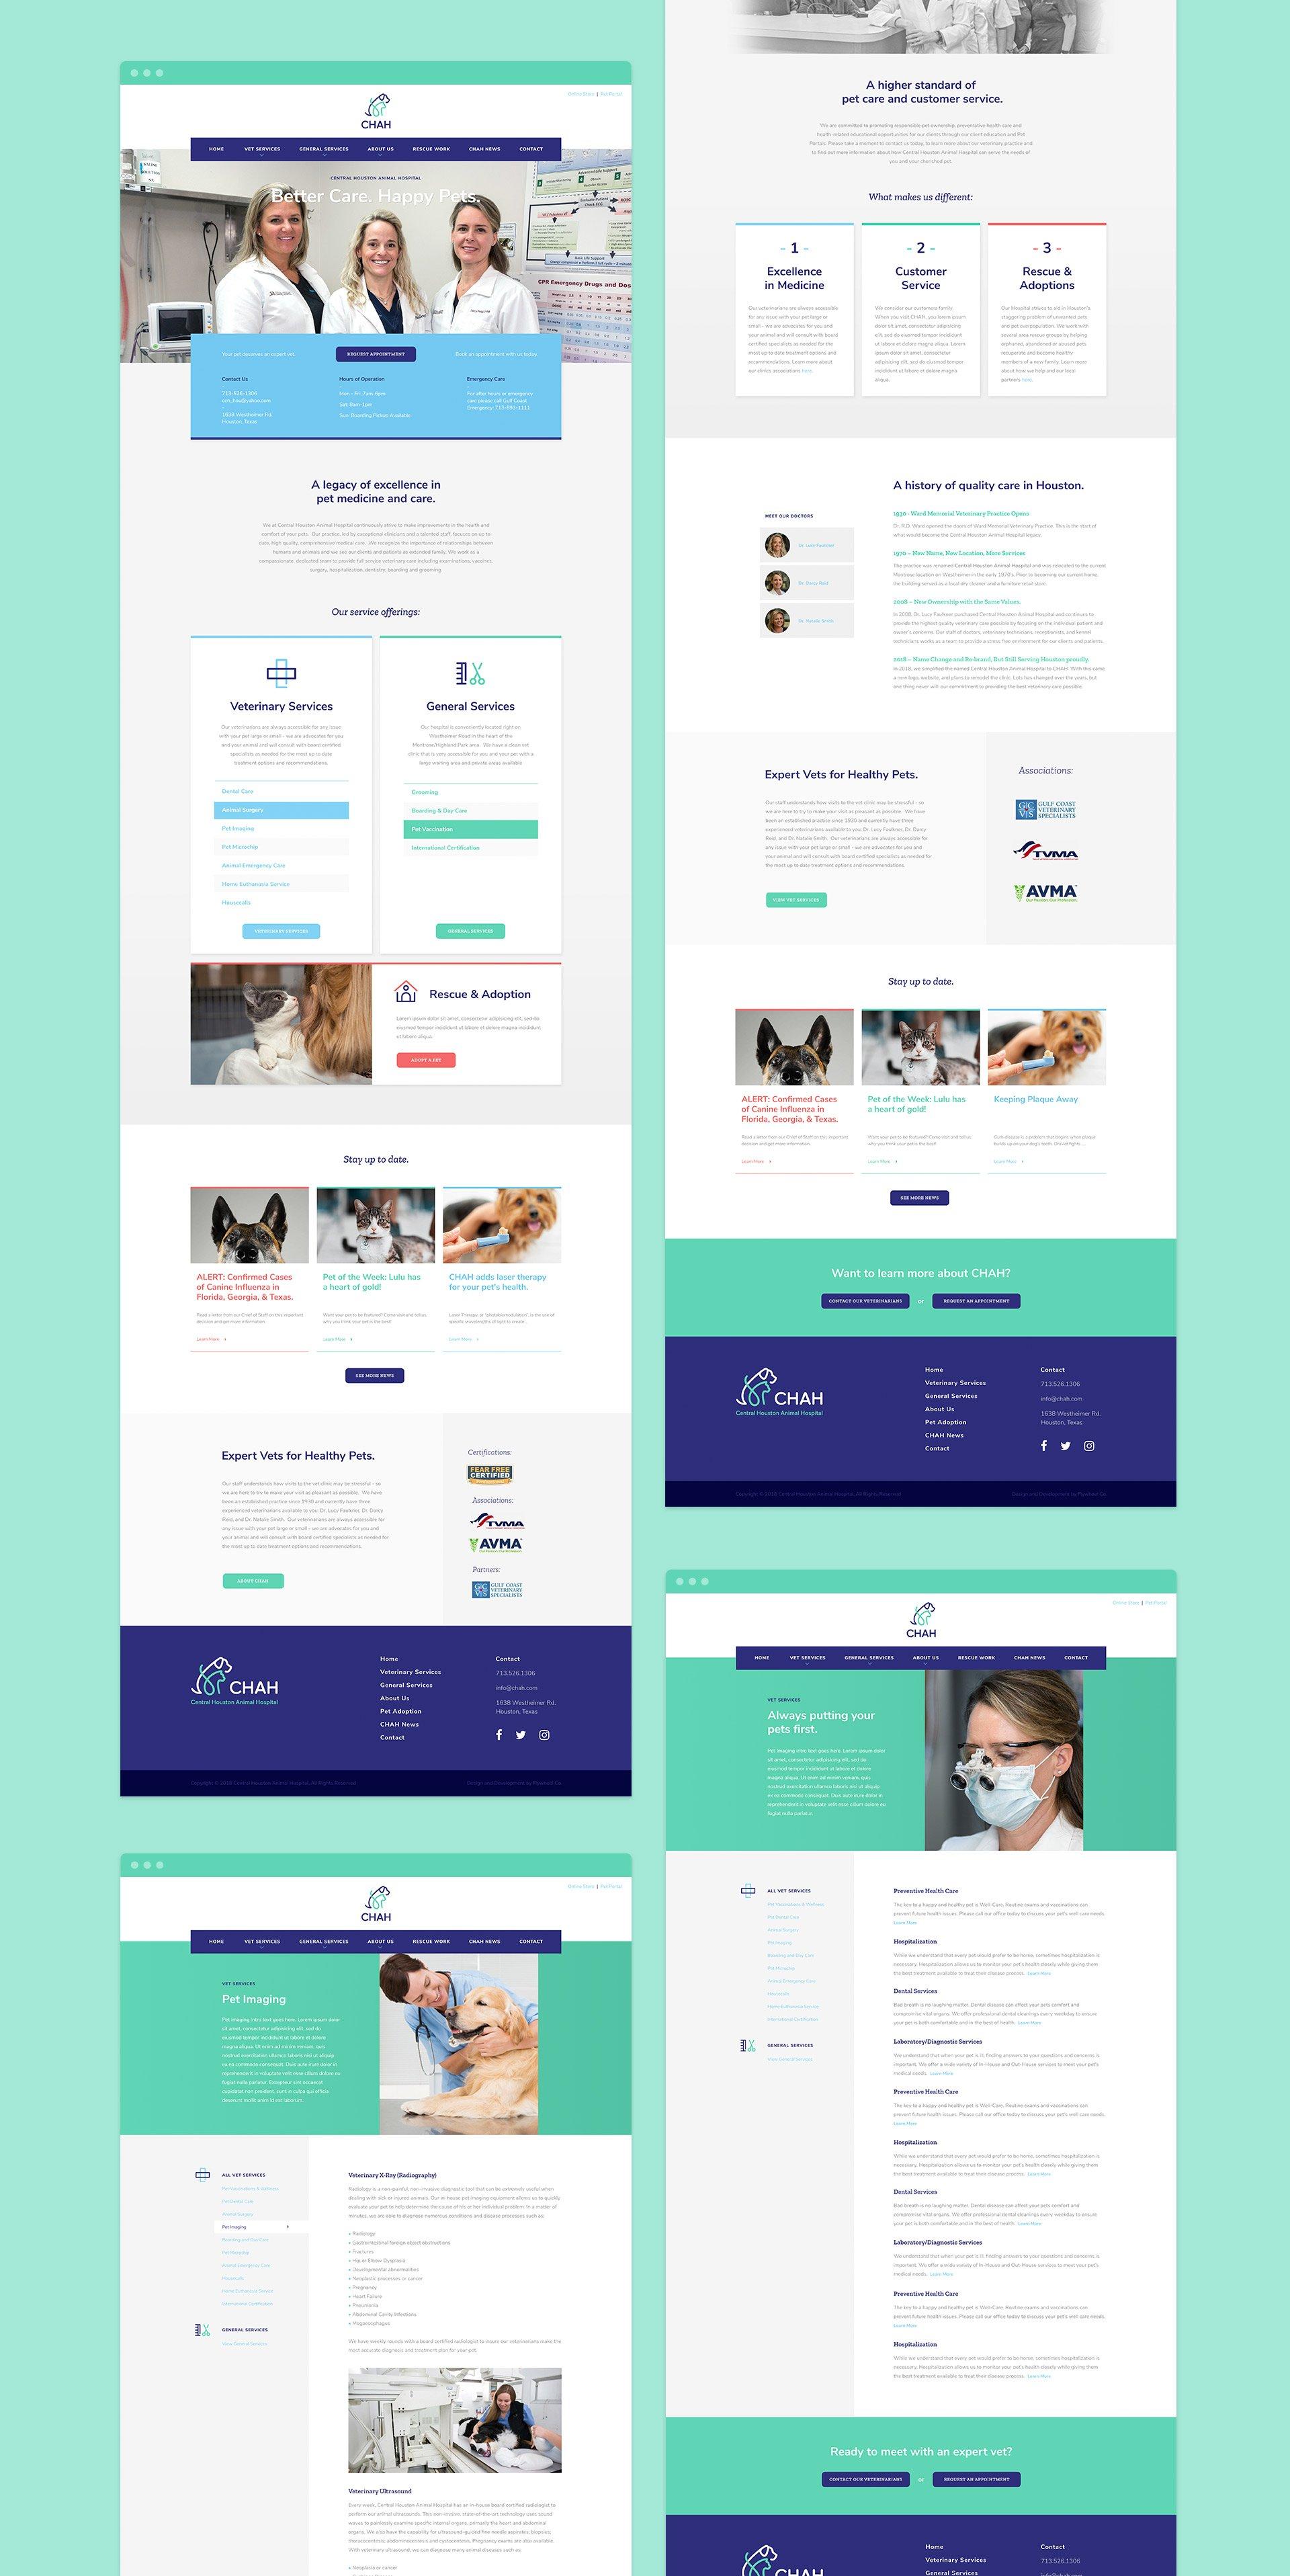 CHAH website design collage